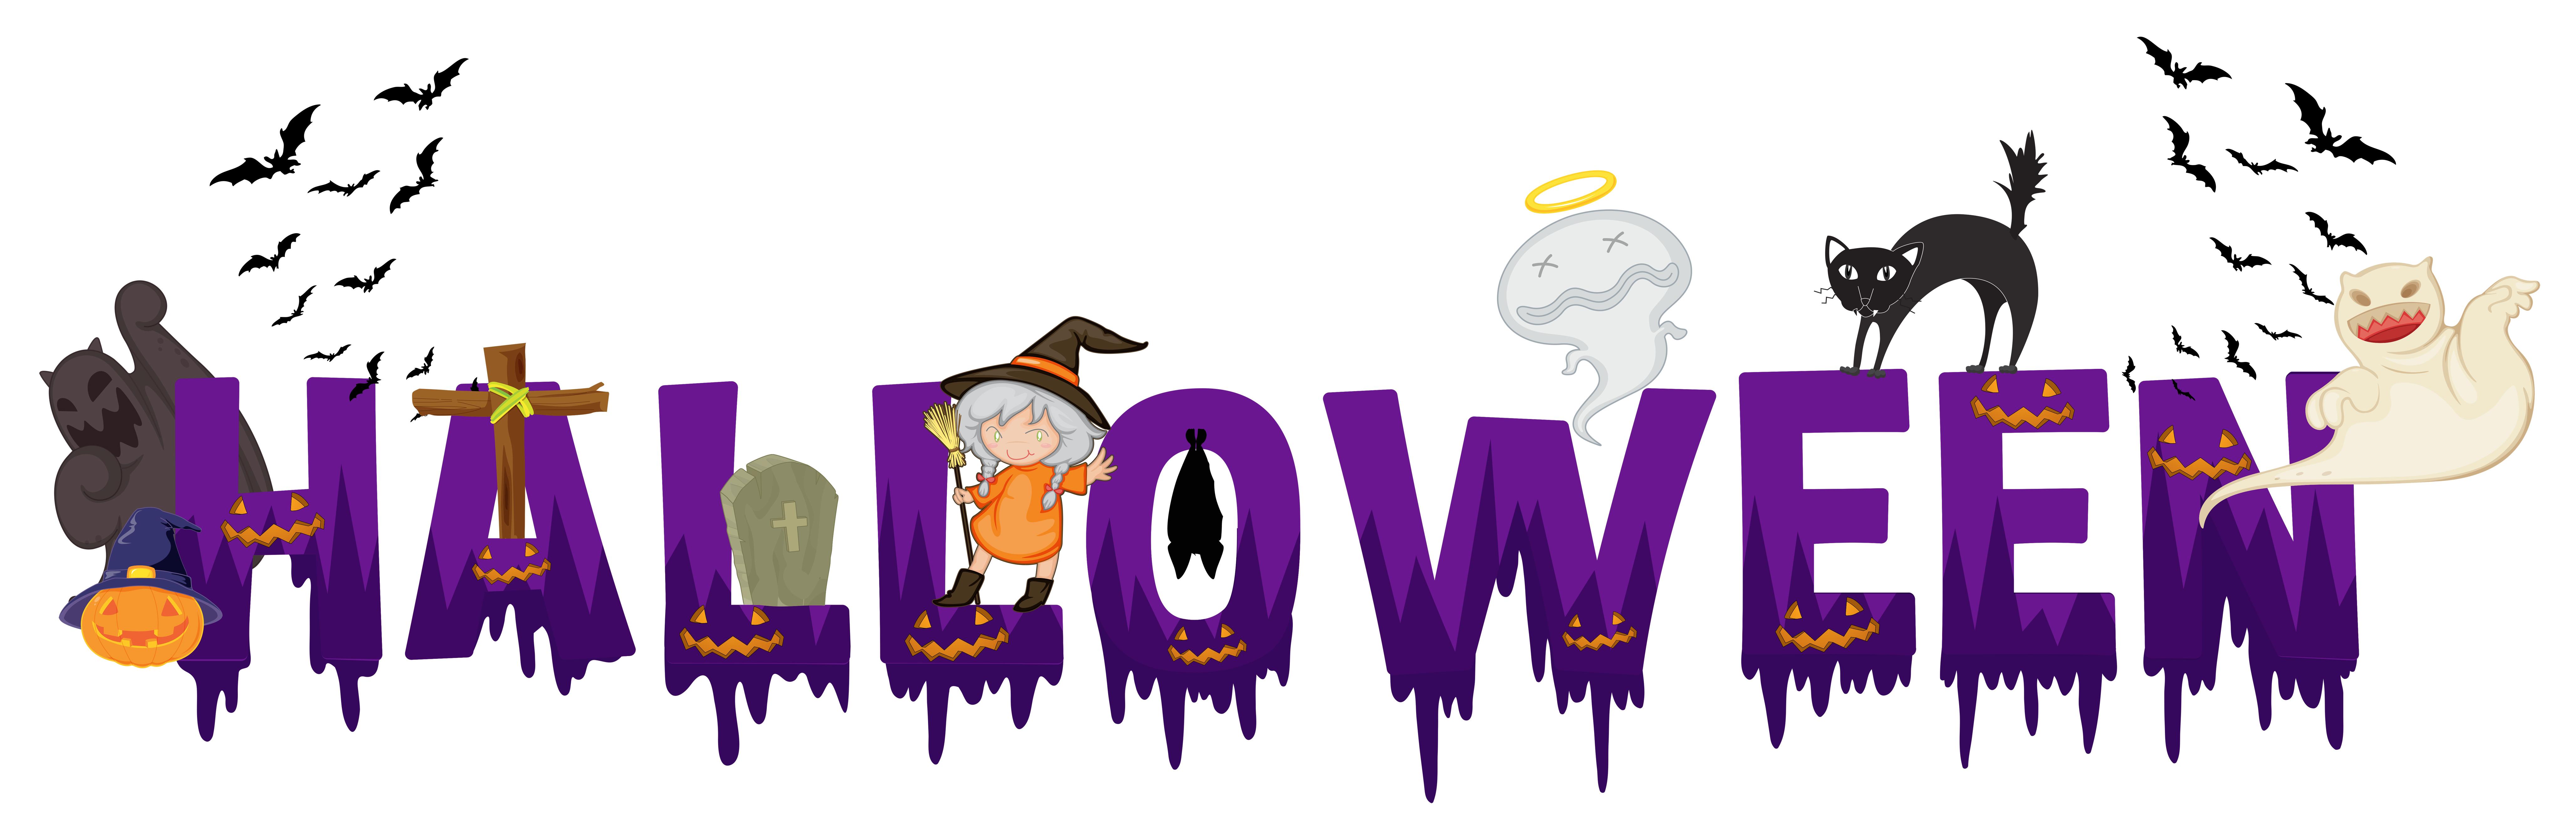 Font design for word halloween - Download Free Vectors ...